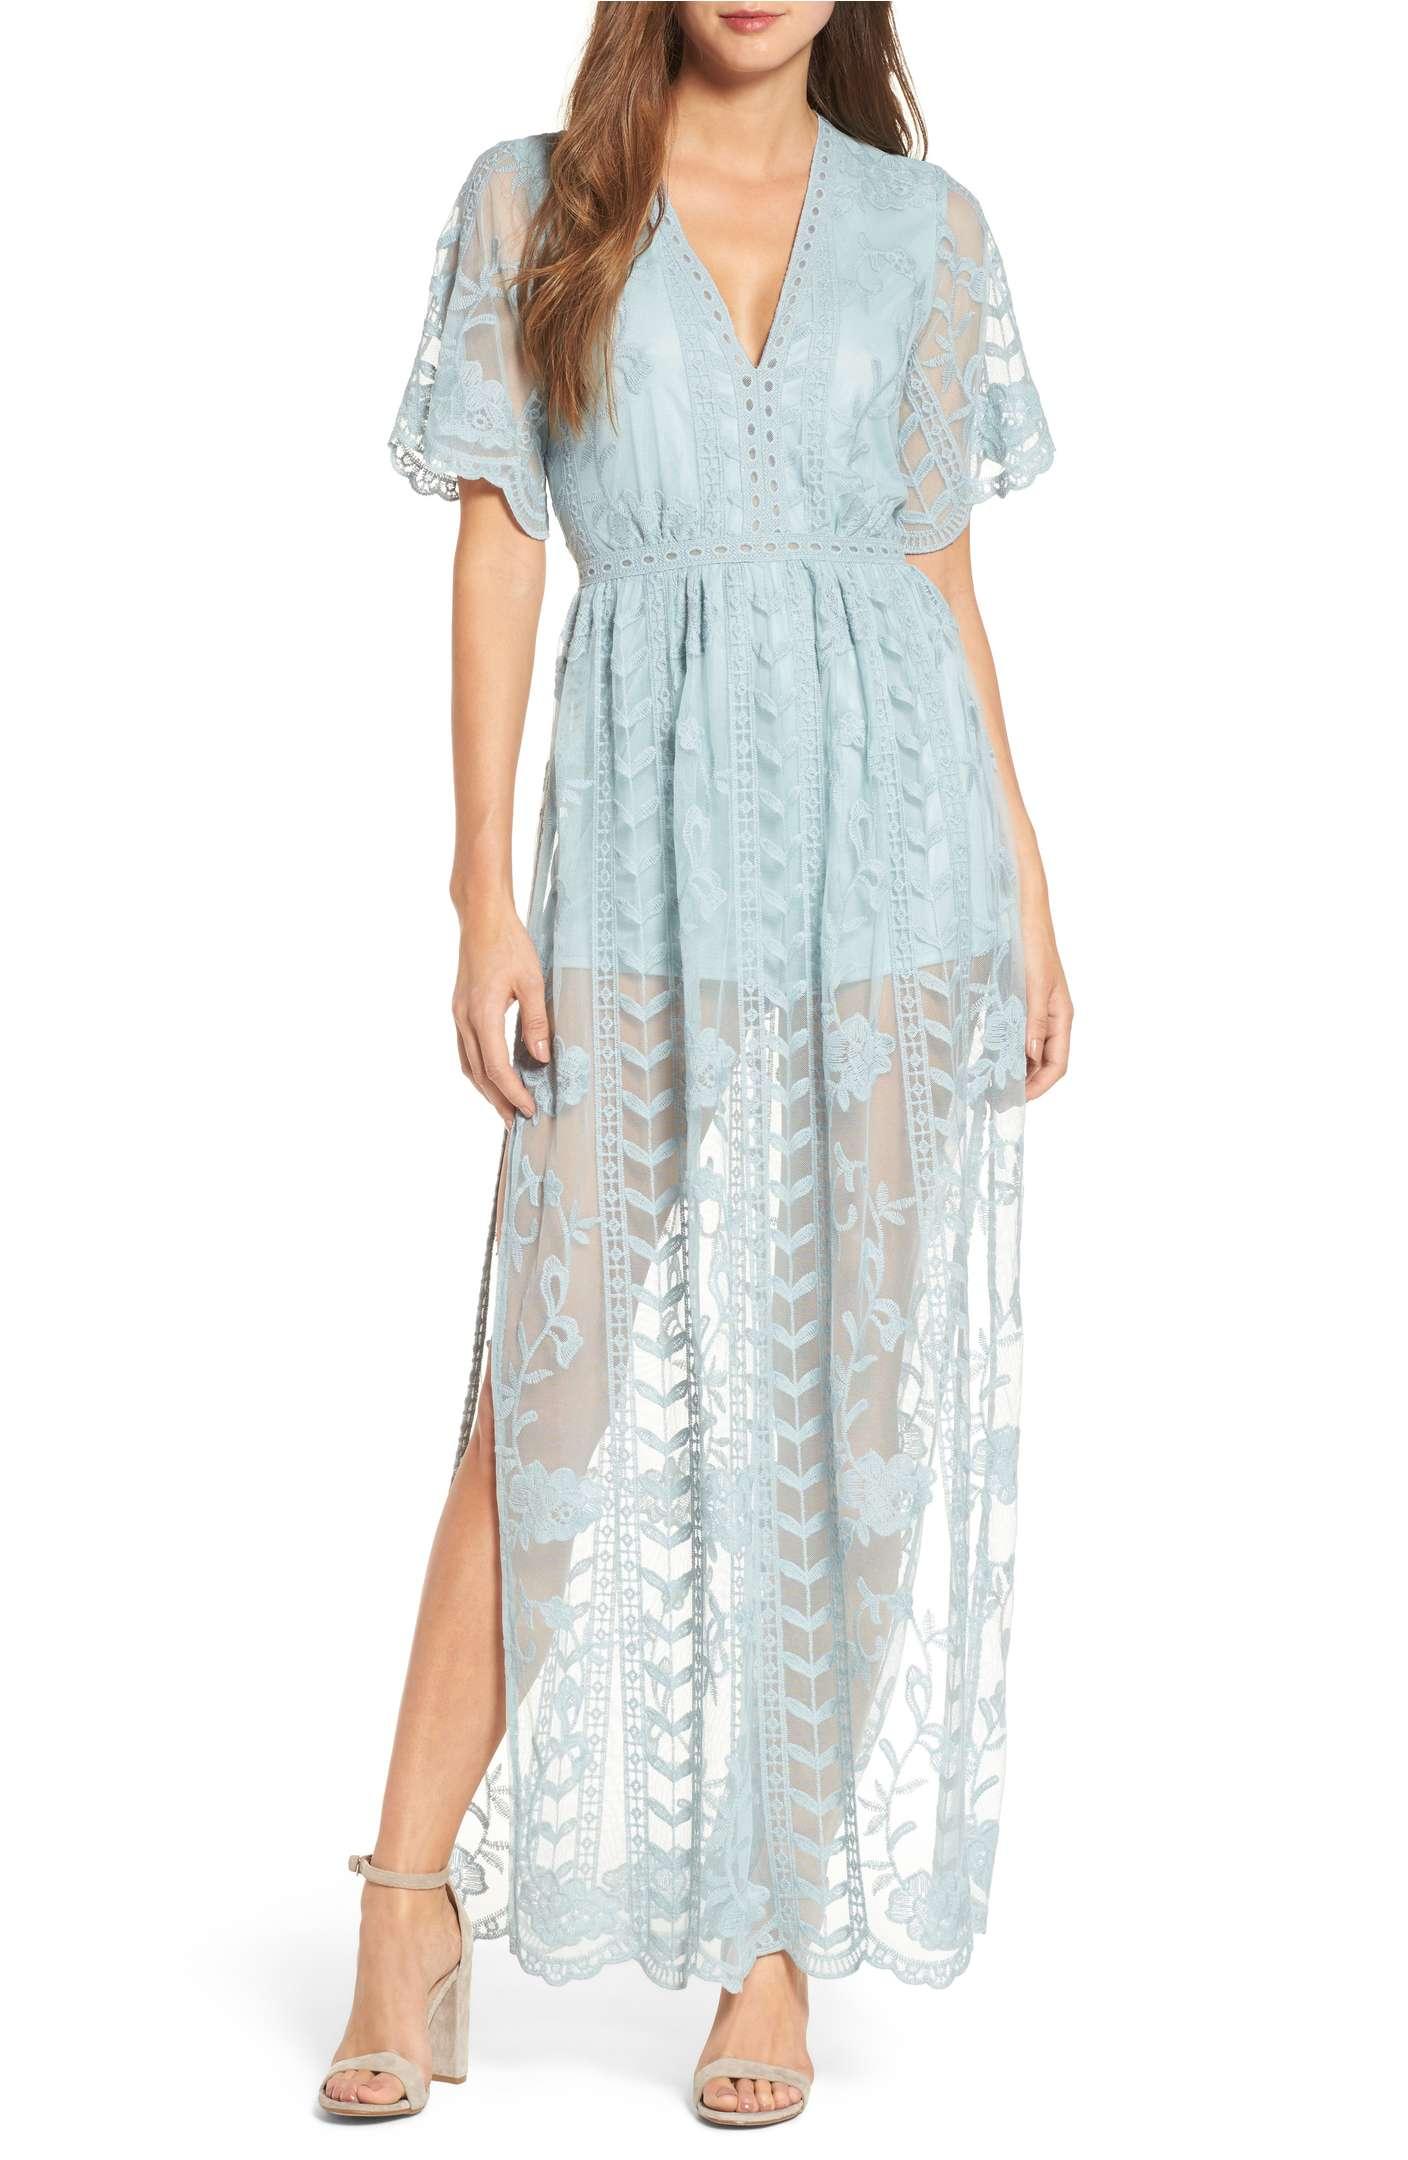 Spring Fashion: Lace Romper